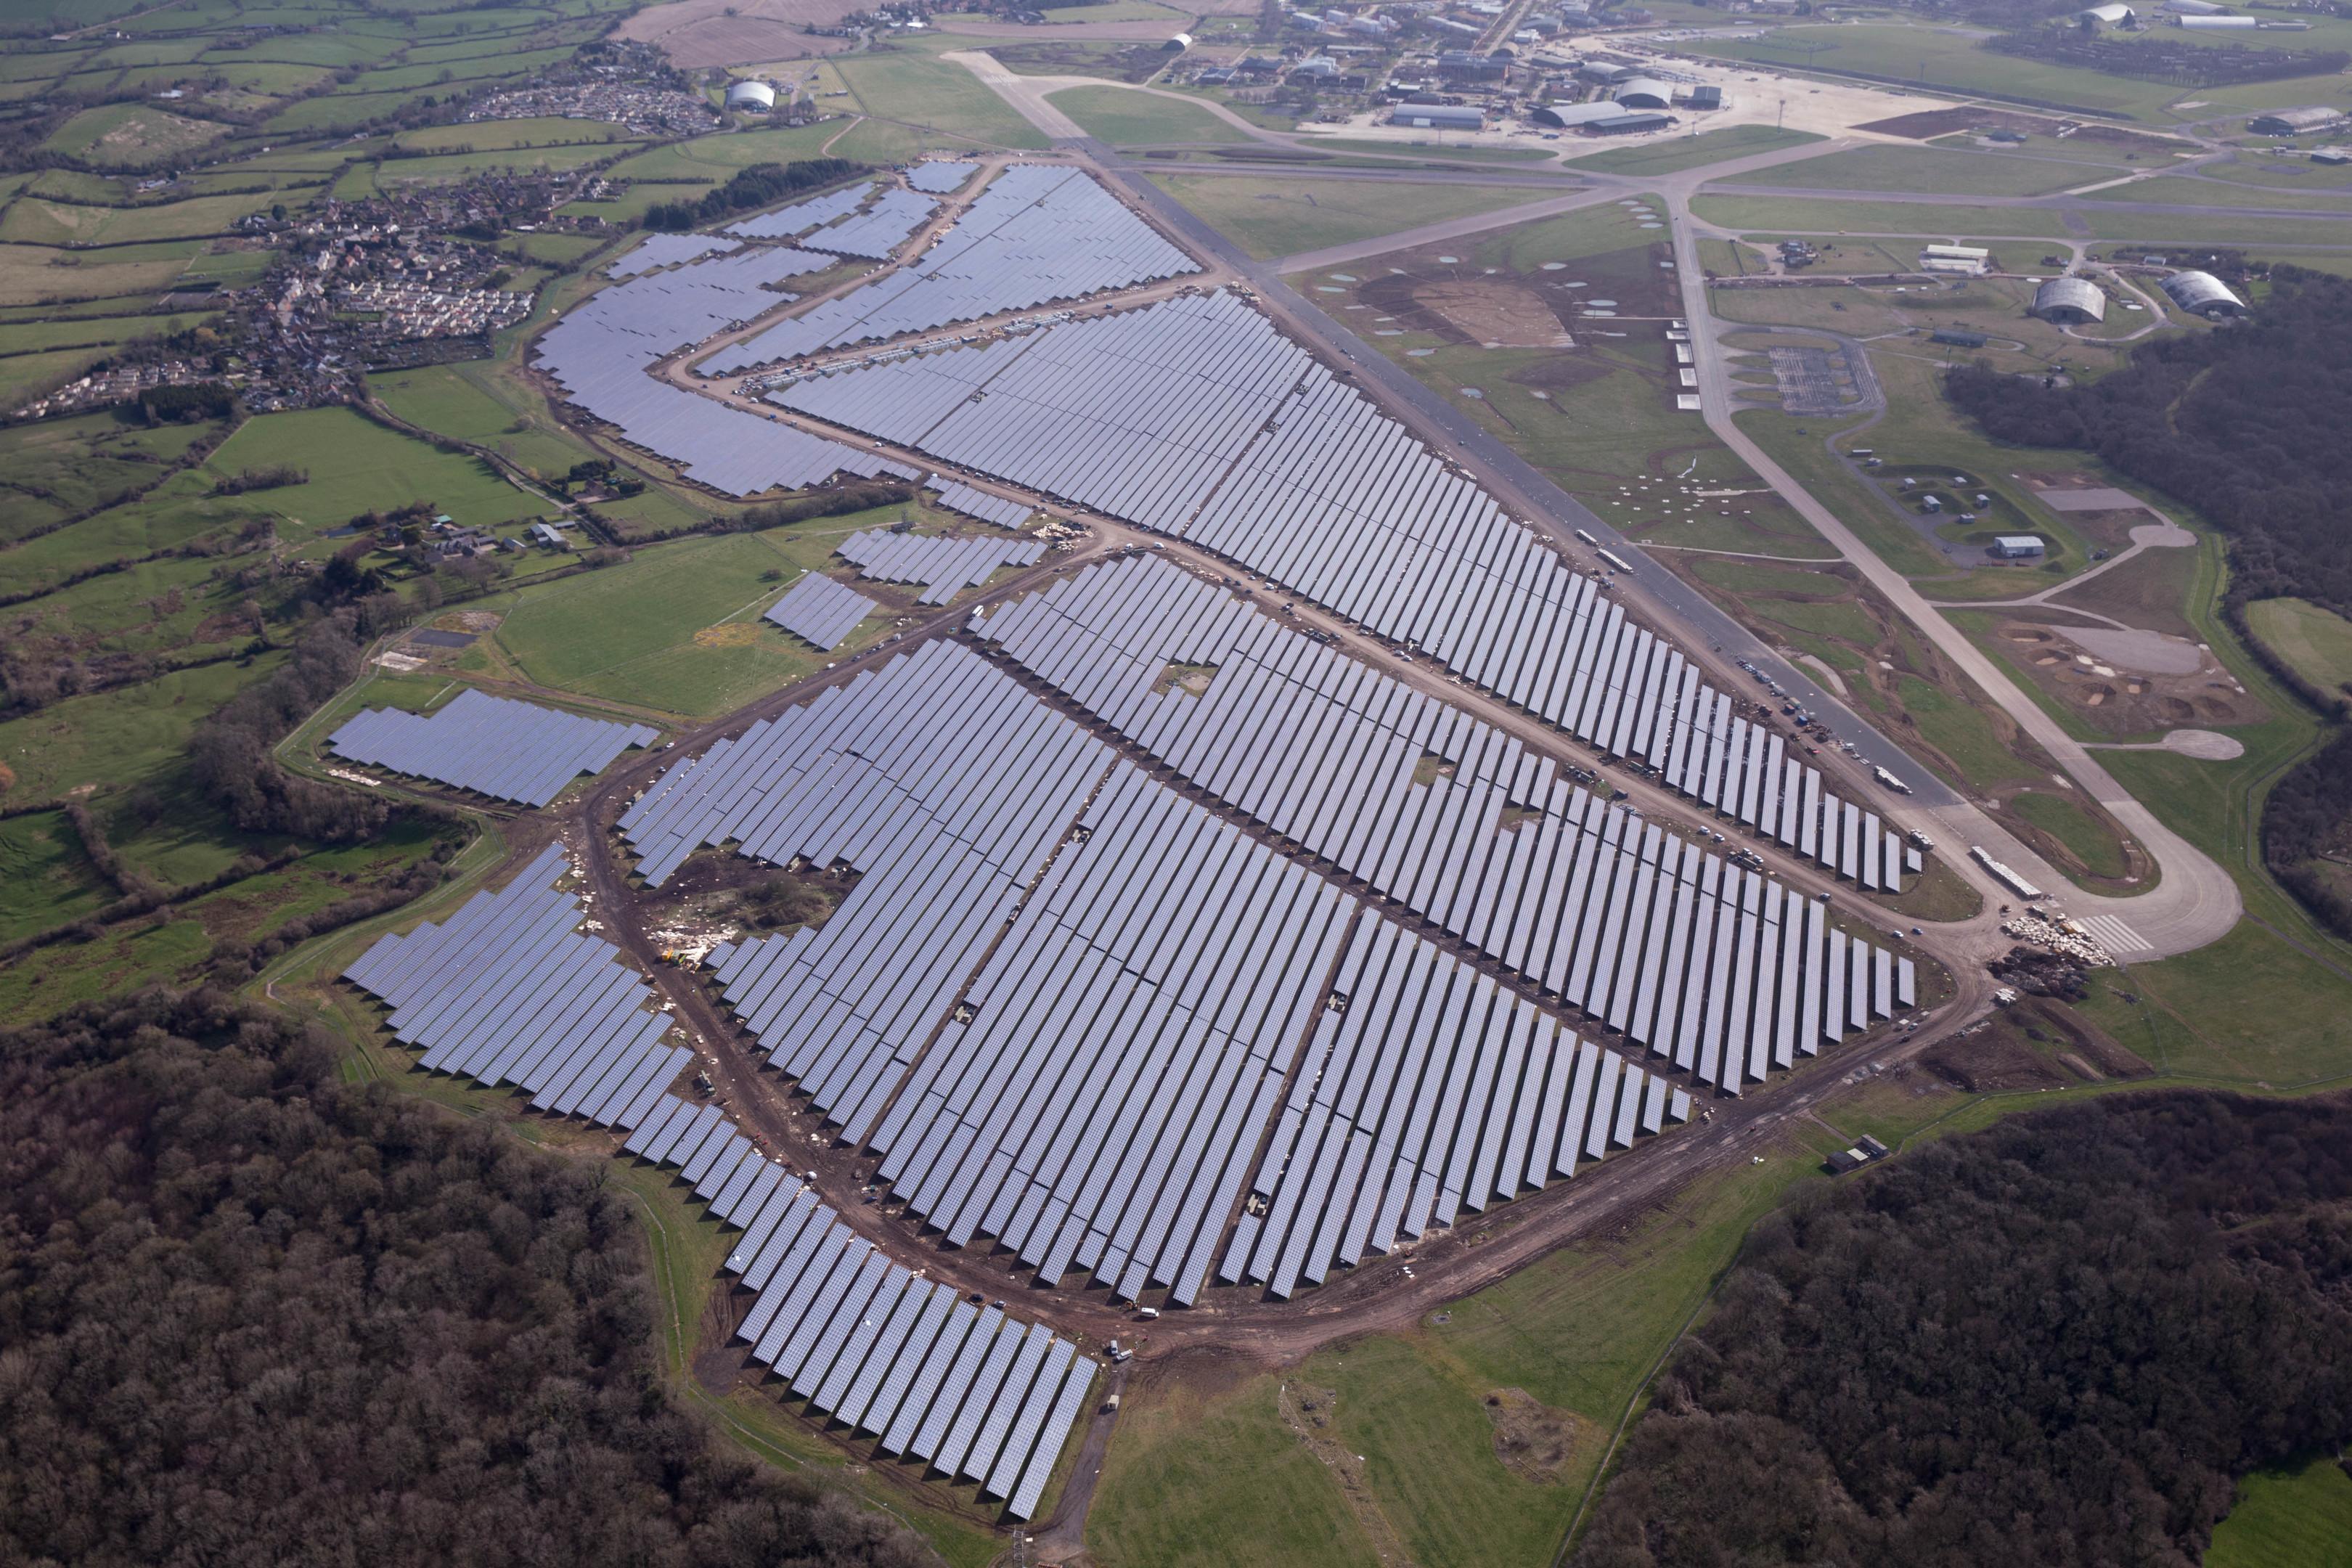 Bradenstoke solar power plant